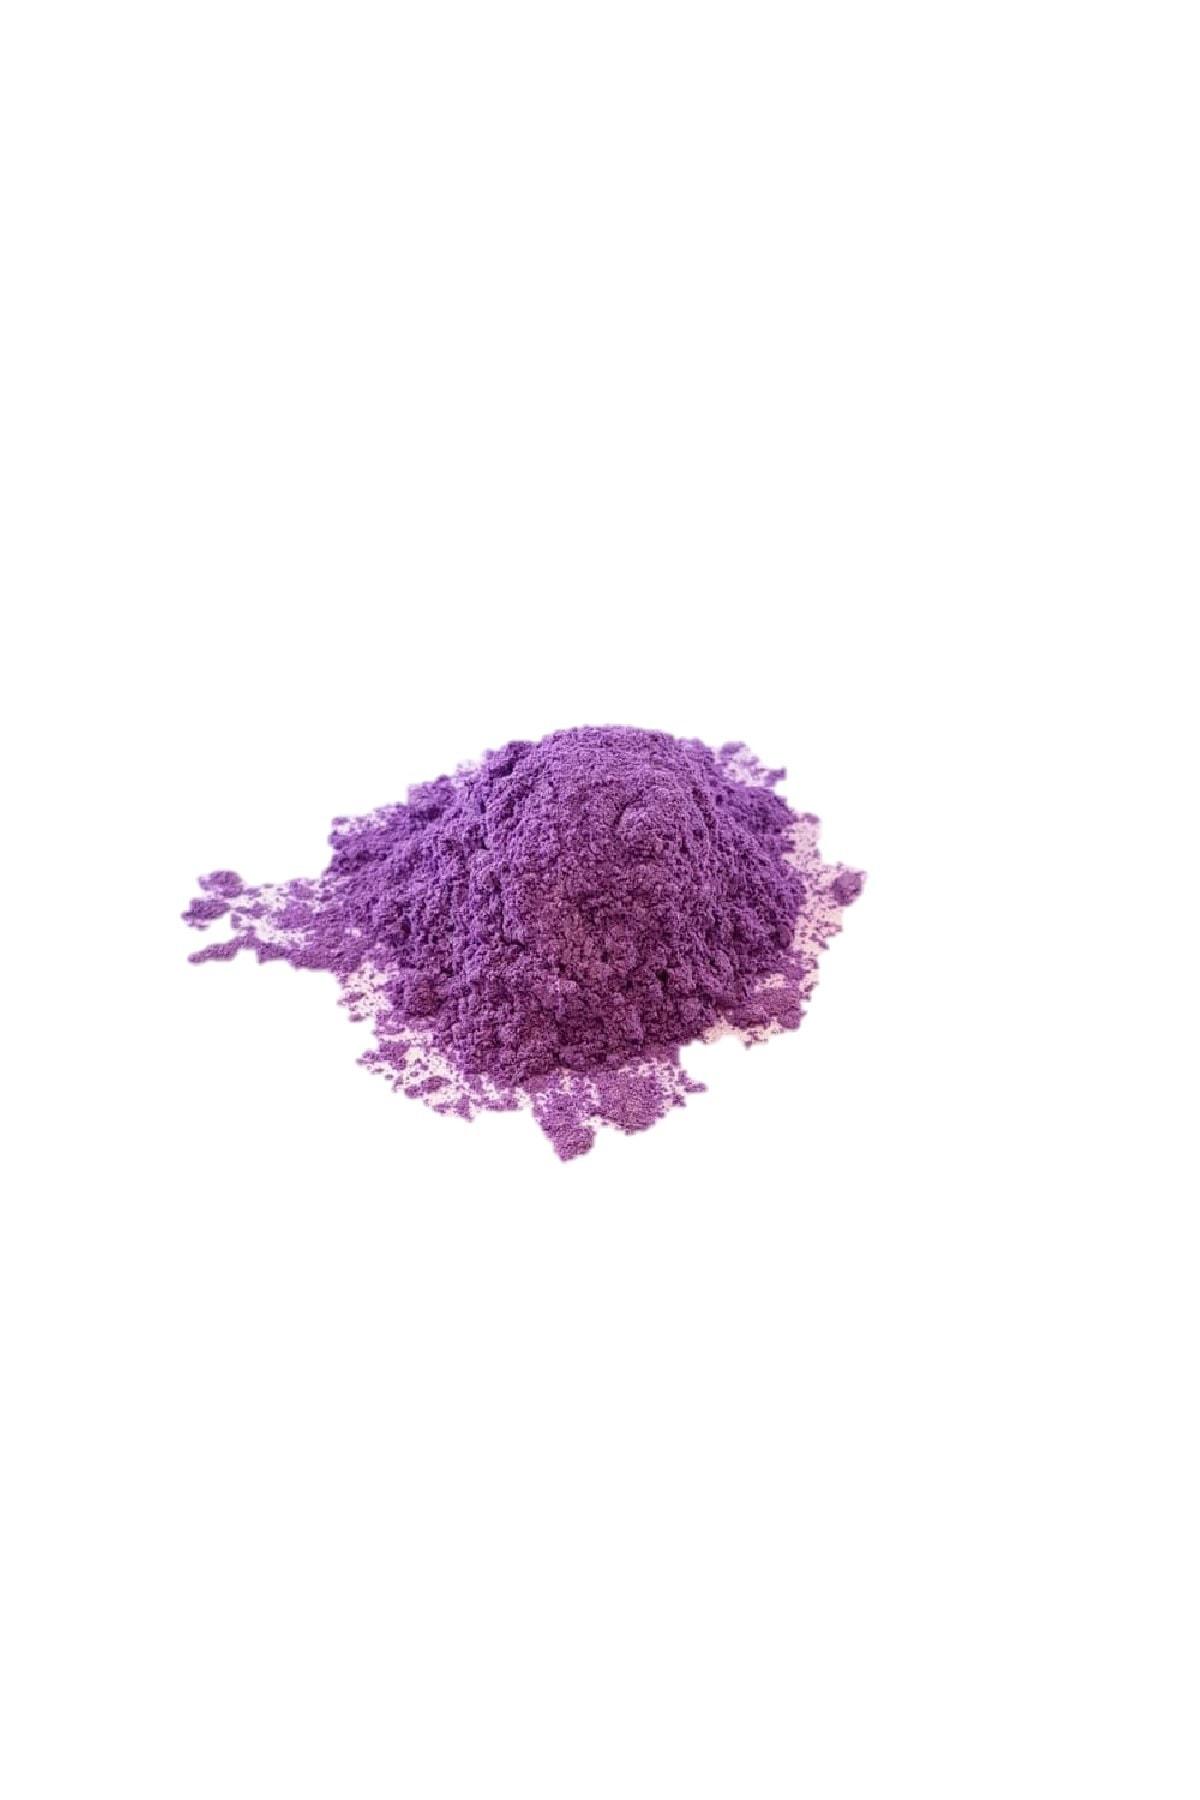 Brtr Kimya 4 Renk Pembe Sedefli Epoksi Metalik Toz Pigment Seti 2